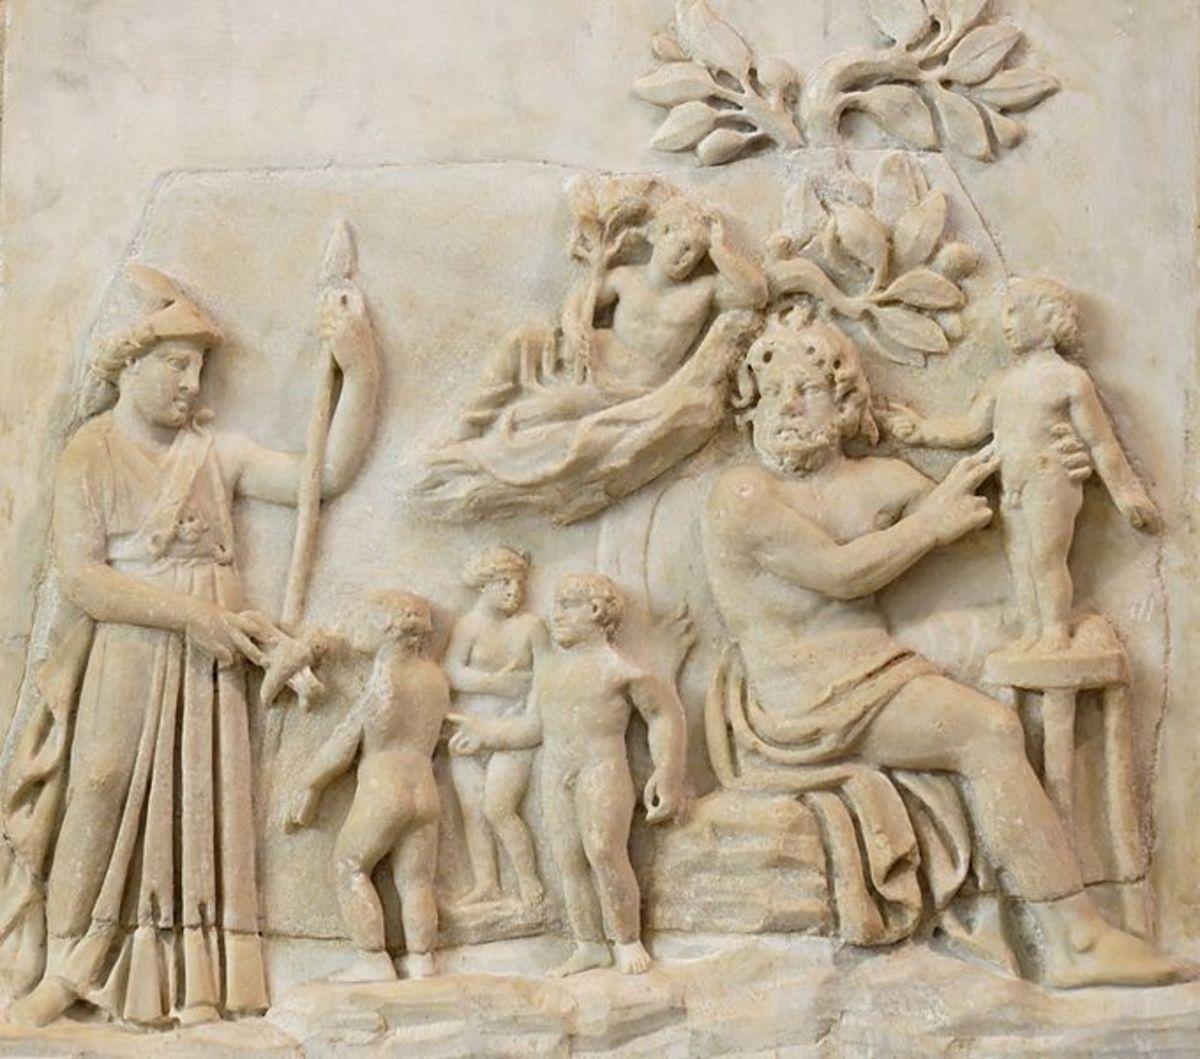 Italian marble relief, c 3rd Century CE.